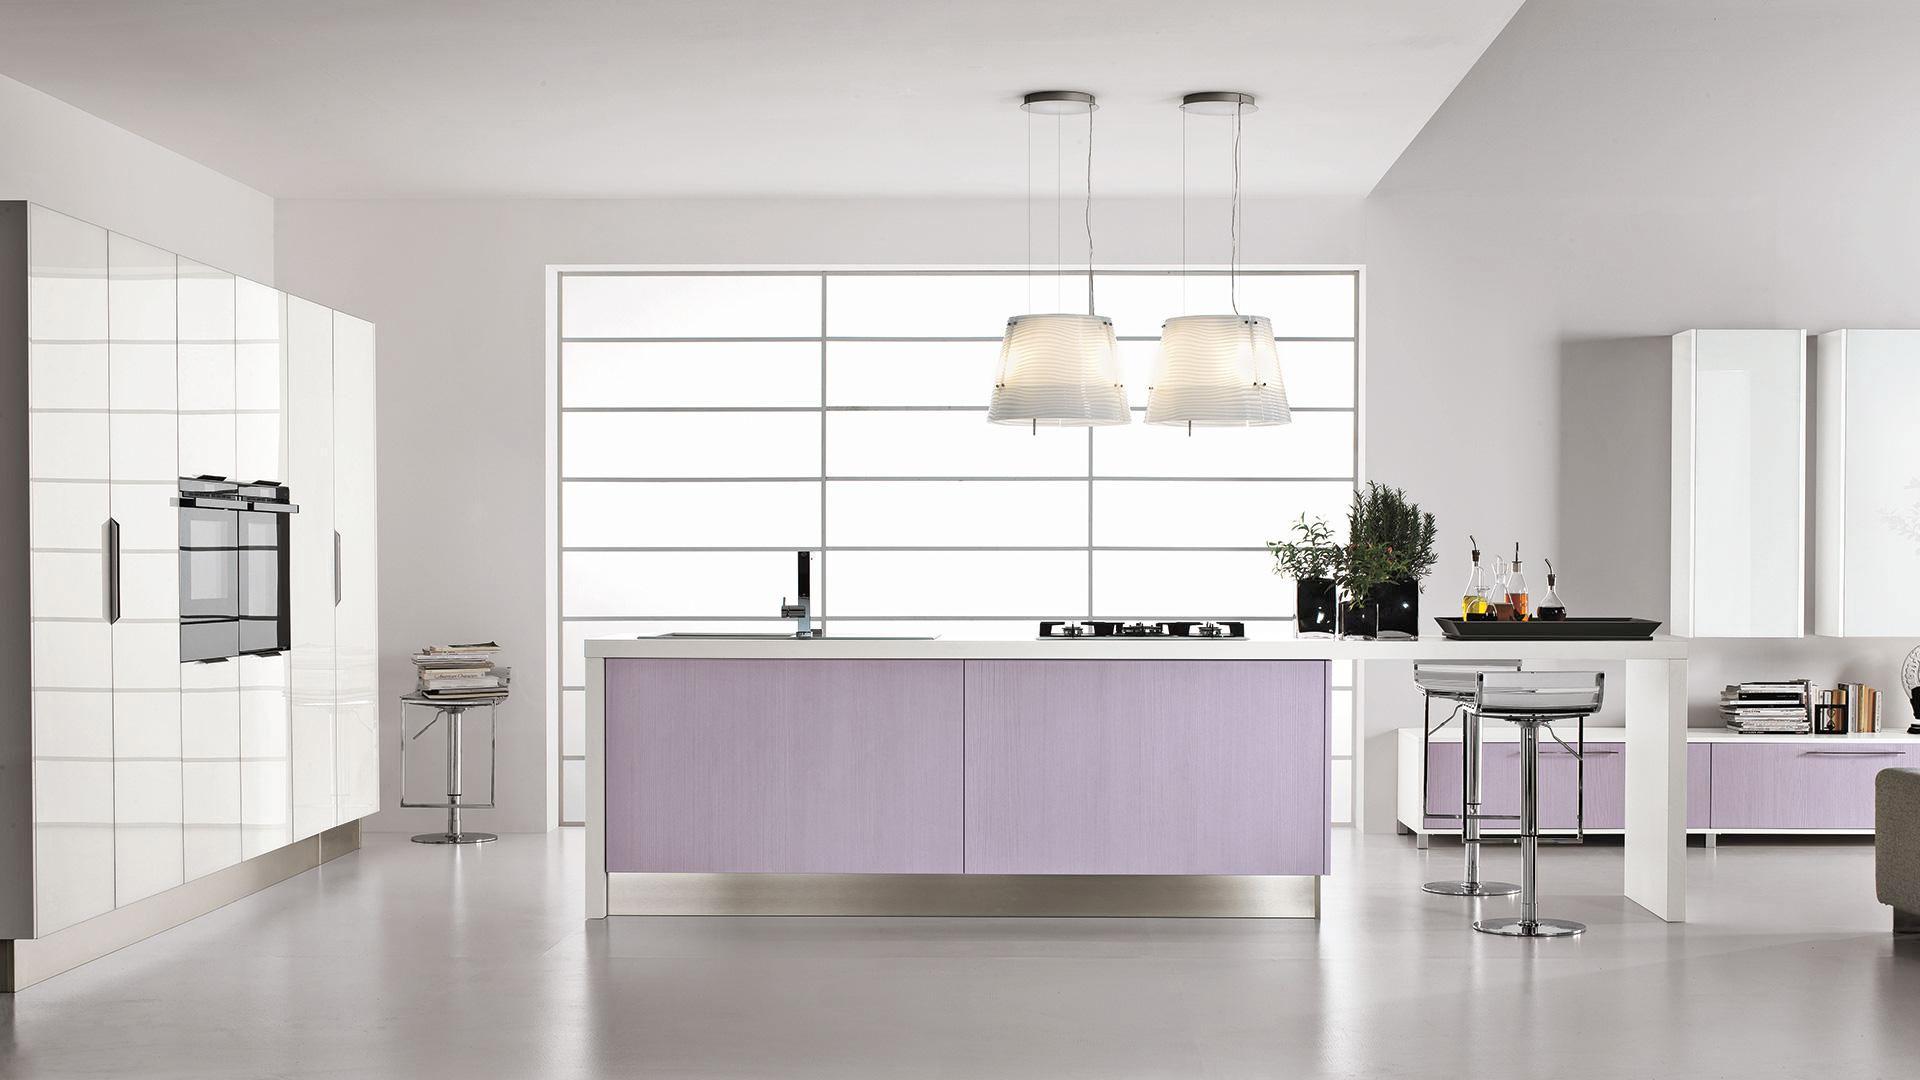 cucine da comporre elegant ordine with cucine da comporre fabulous cucine colorate come un. Black Bedroom Furniture Sets. Home Design Ideas